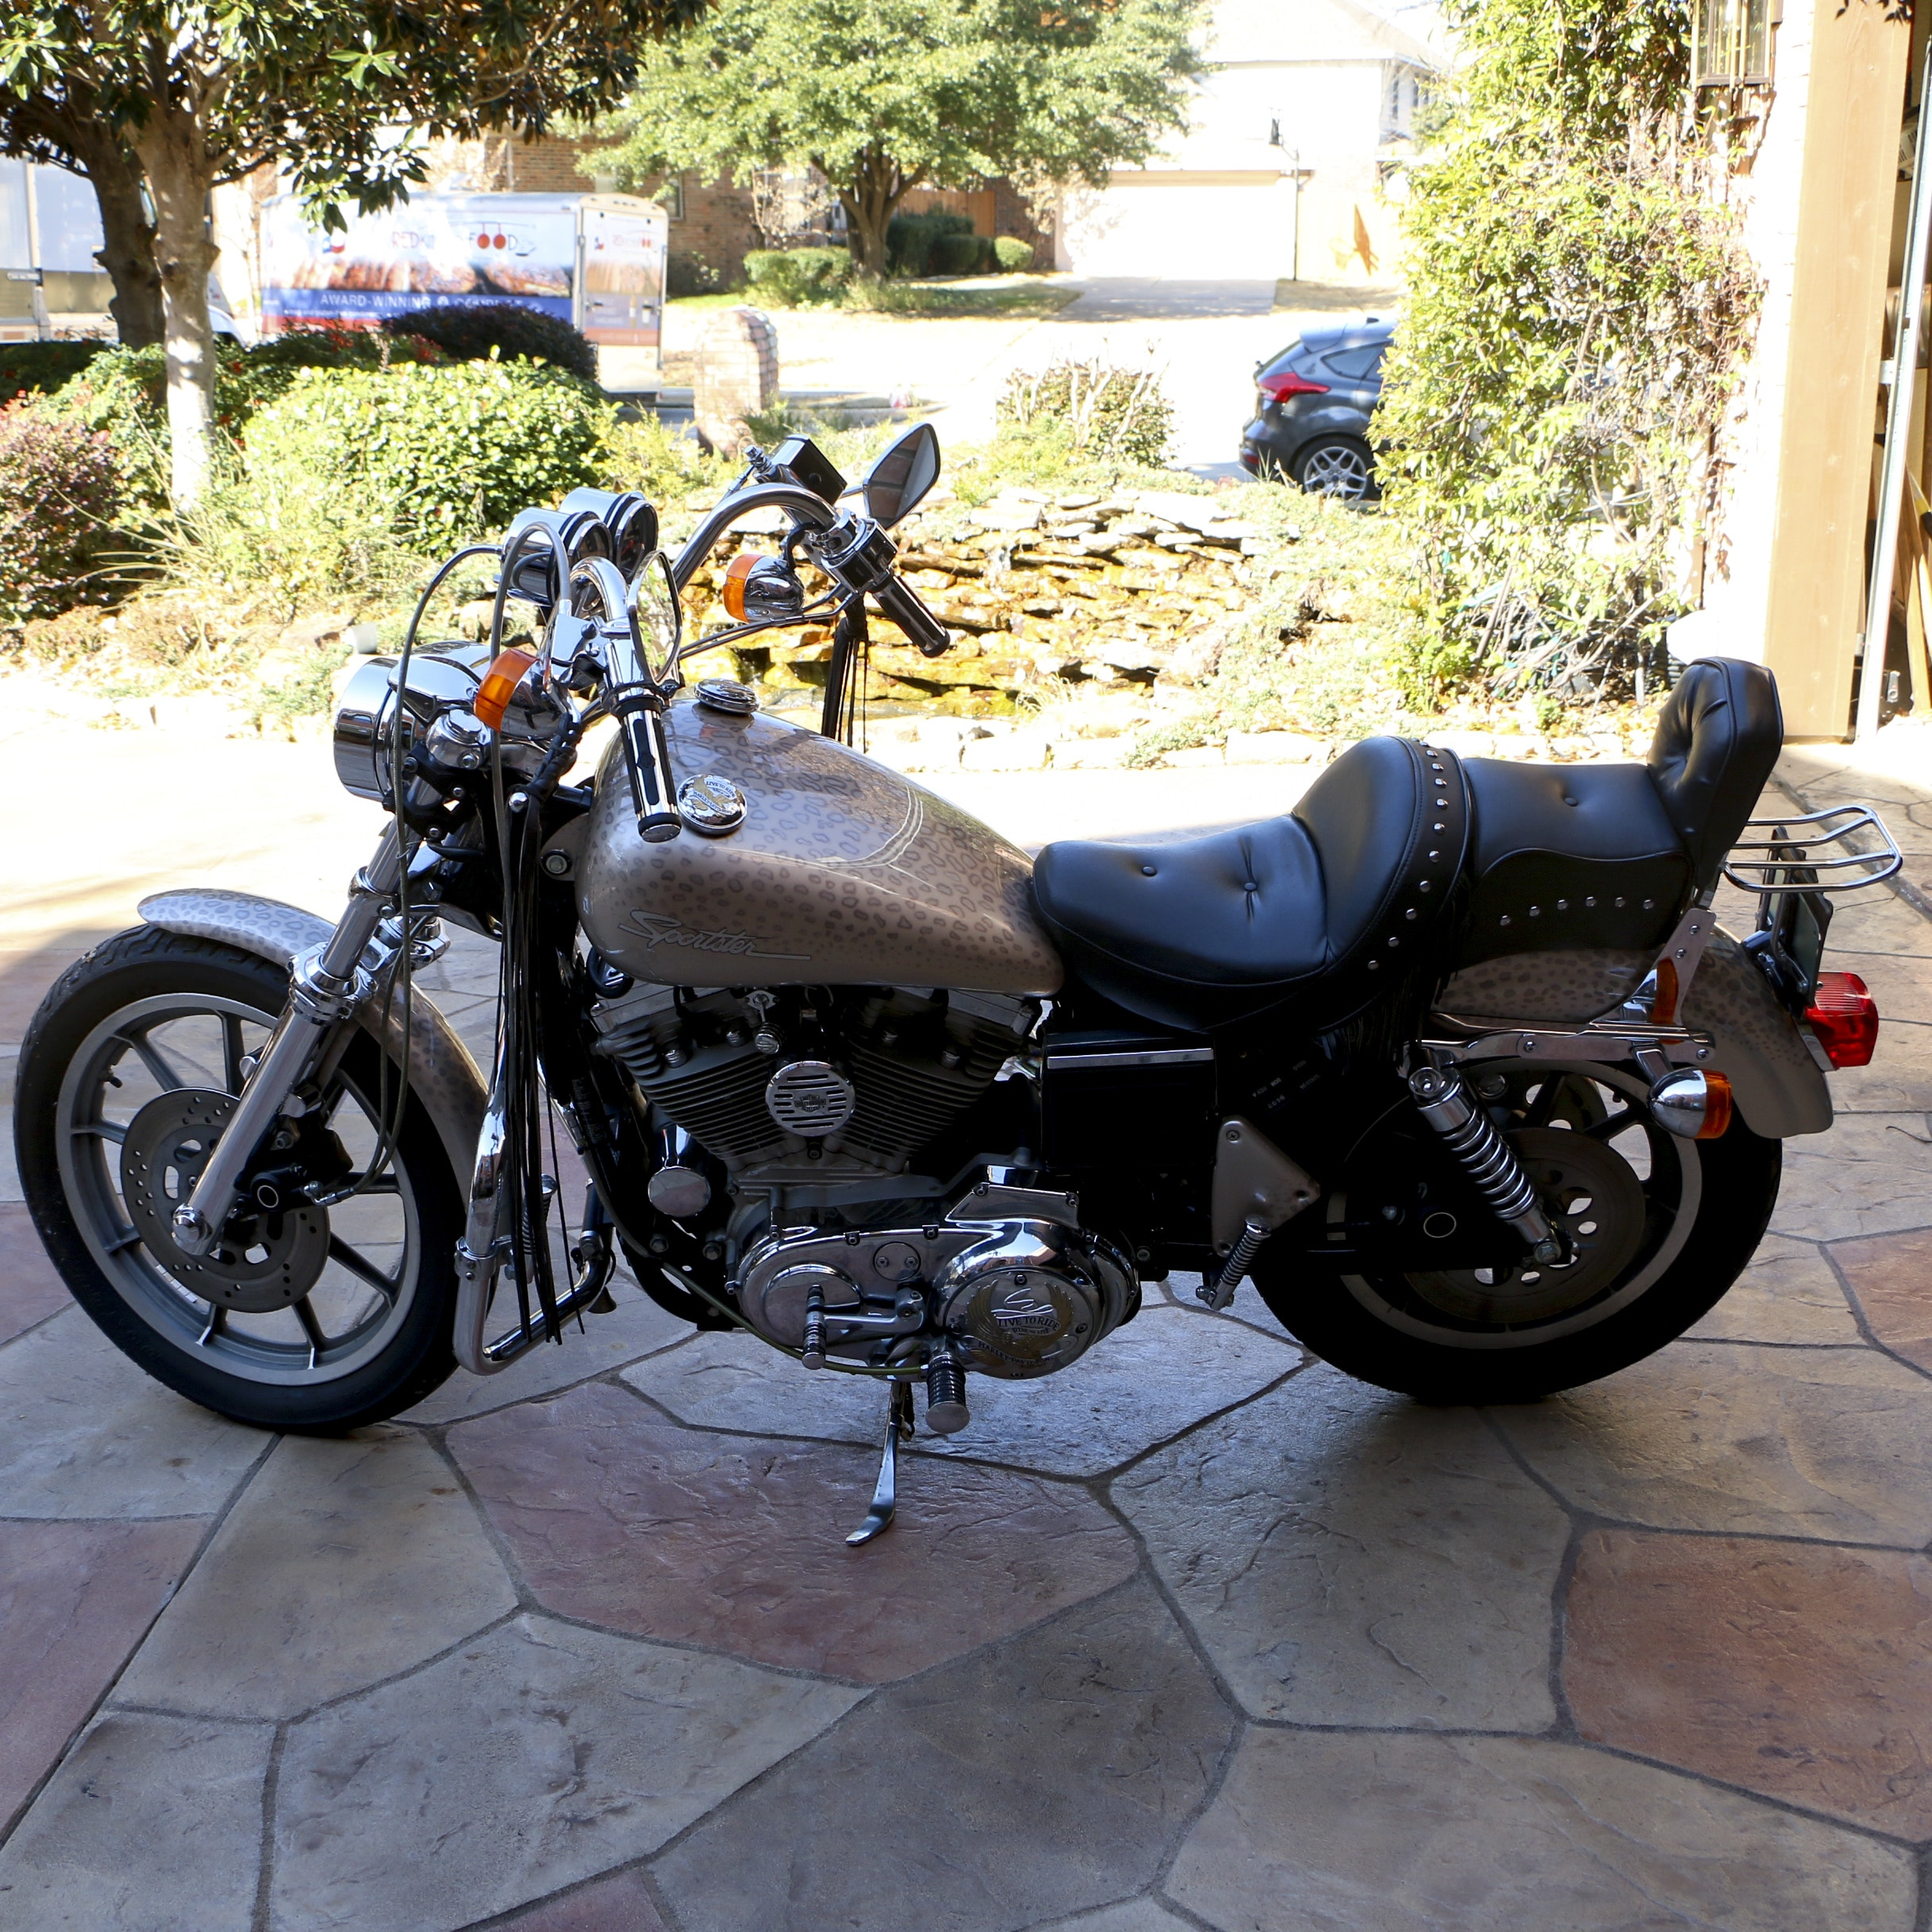 1994 Customized Harley-Davidson 883 Hugger Sportster with 1200CC Engine